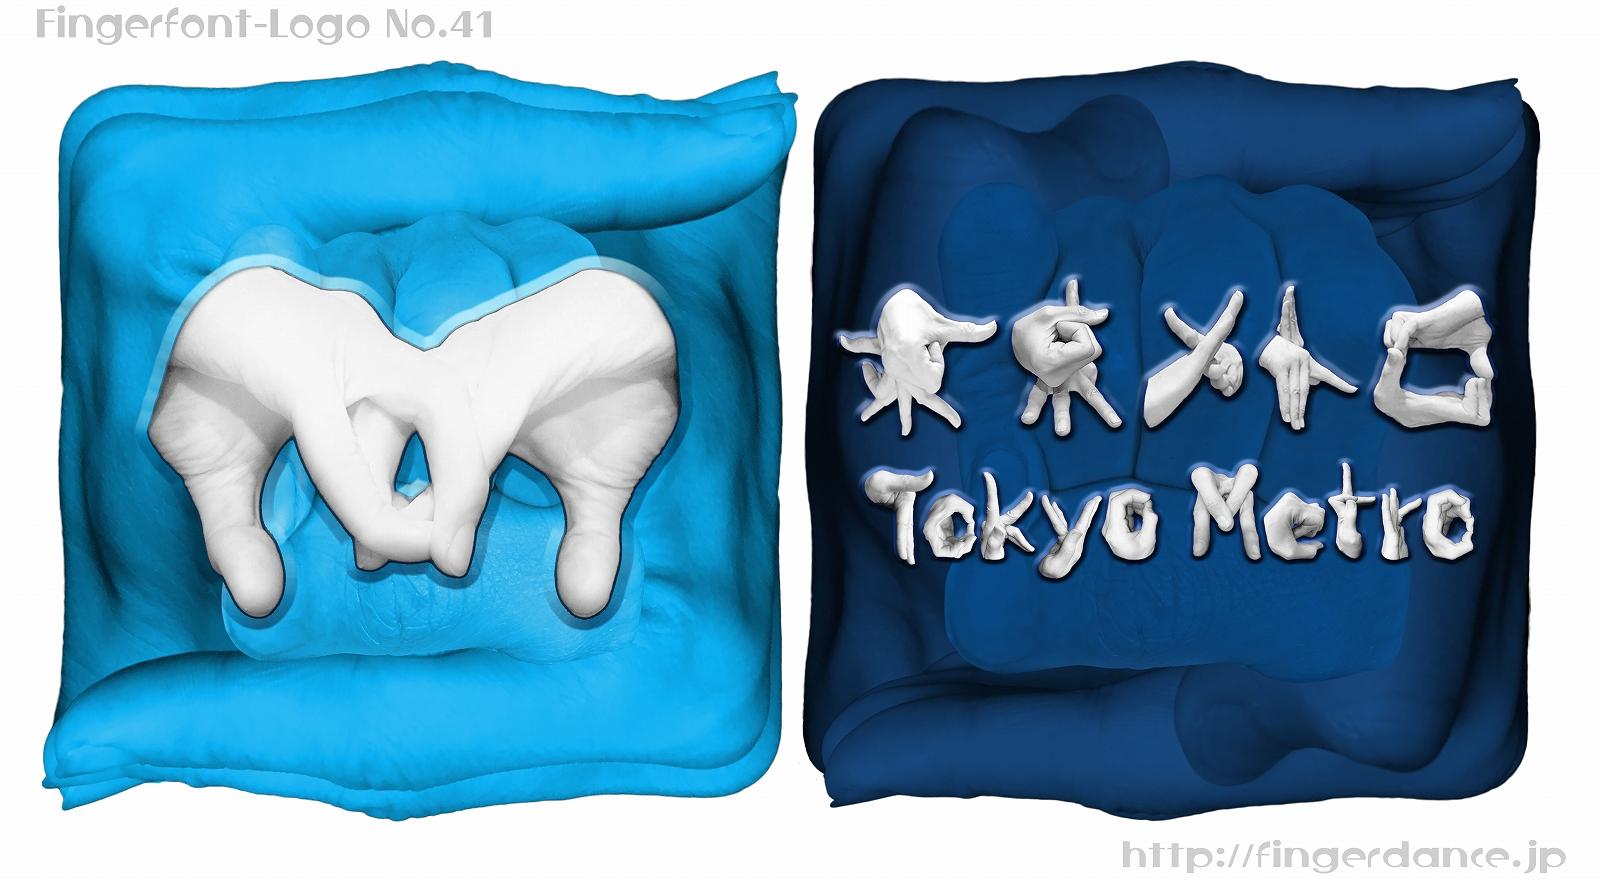 Tokyometro-fingerhttp://fingerdance.jp/L/logohand 東京メトロフィンガーロゴハンド 手指